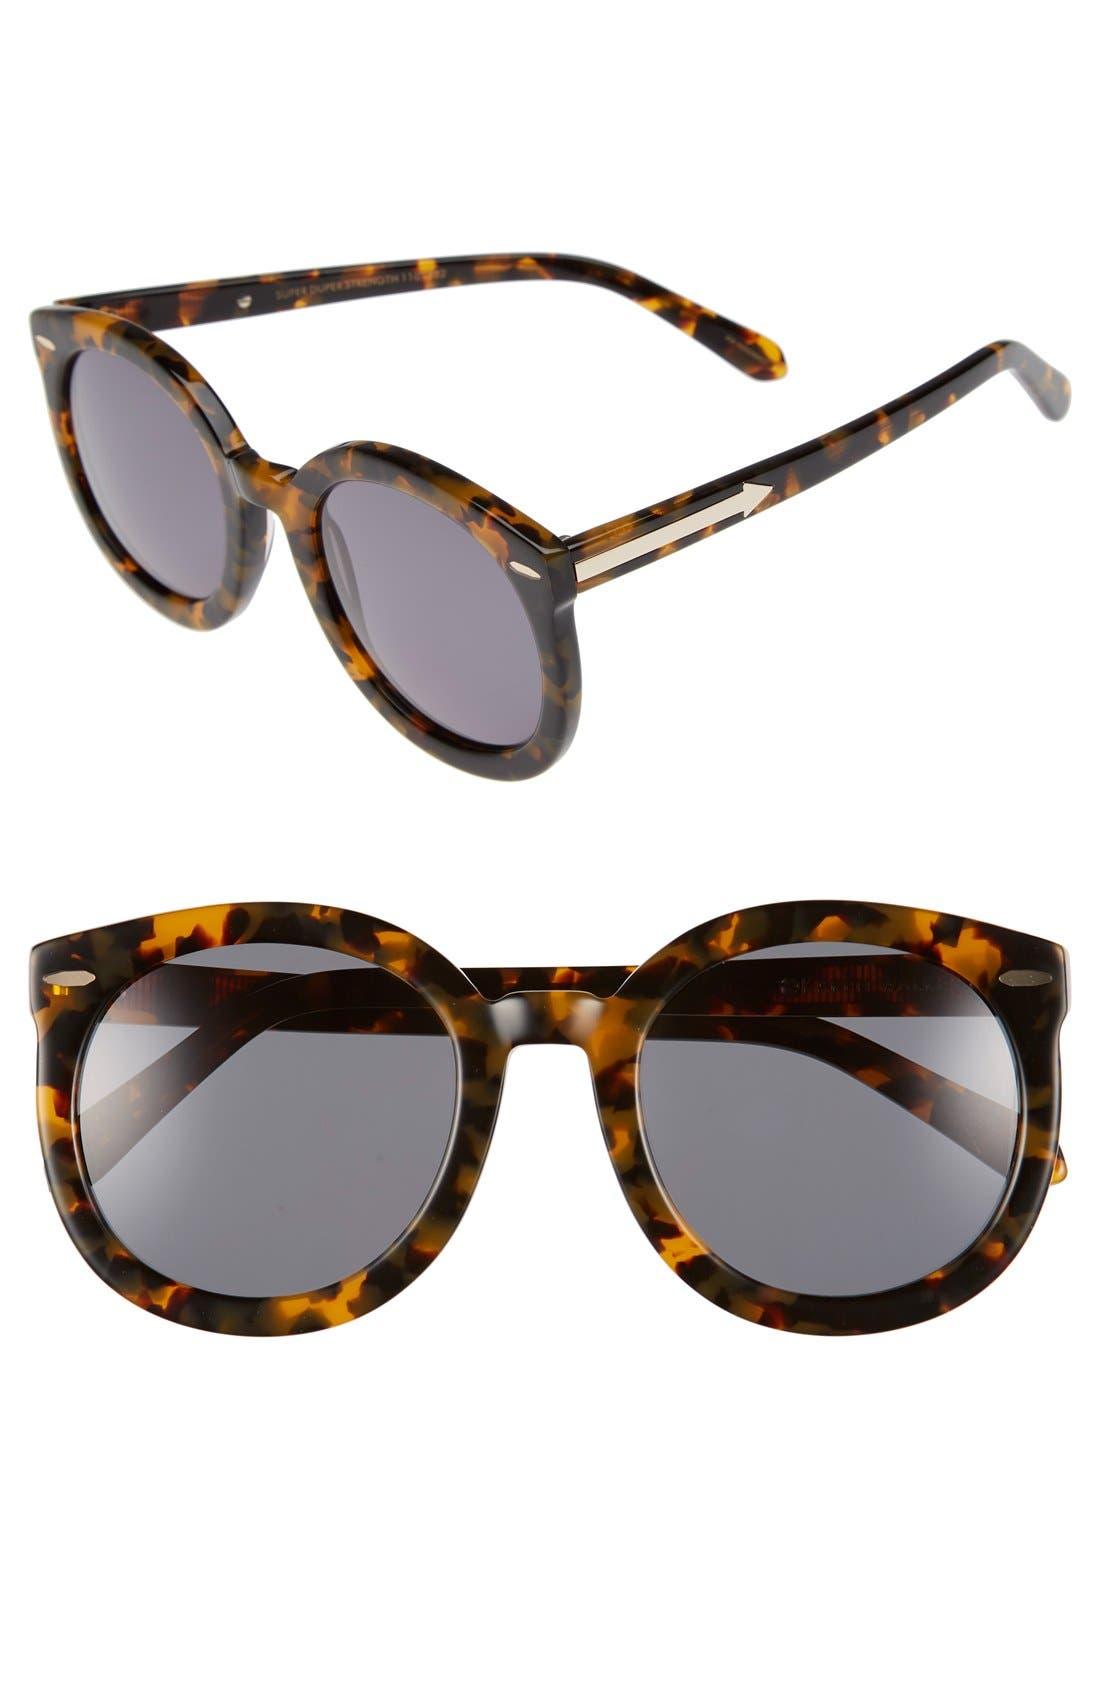 Main Image - Karen Walker Super Duper Strength 55mm Sunglasses